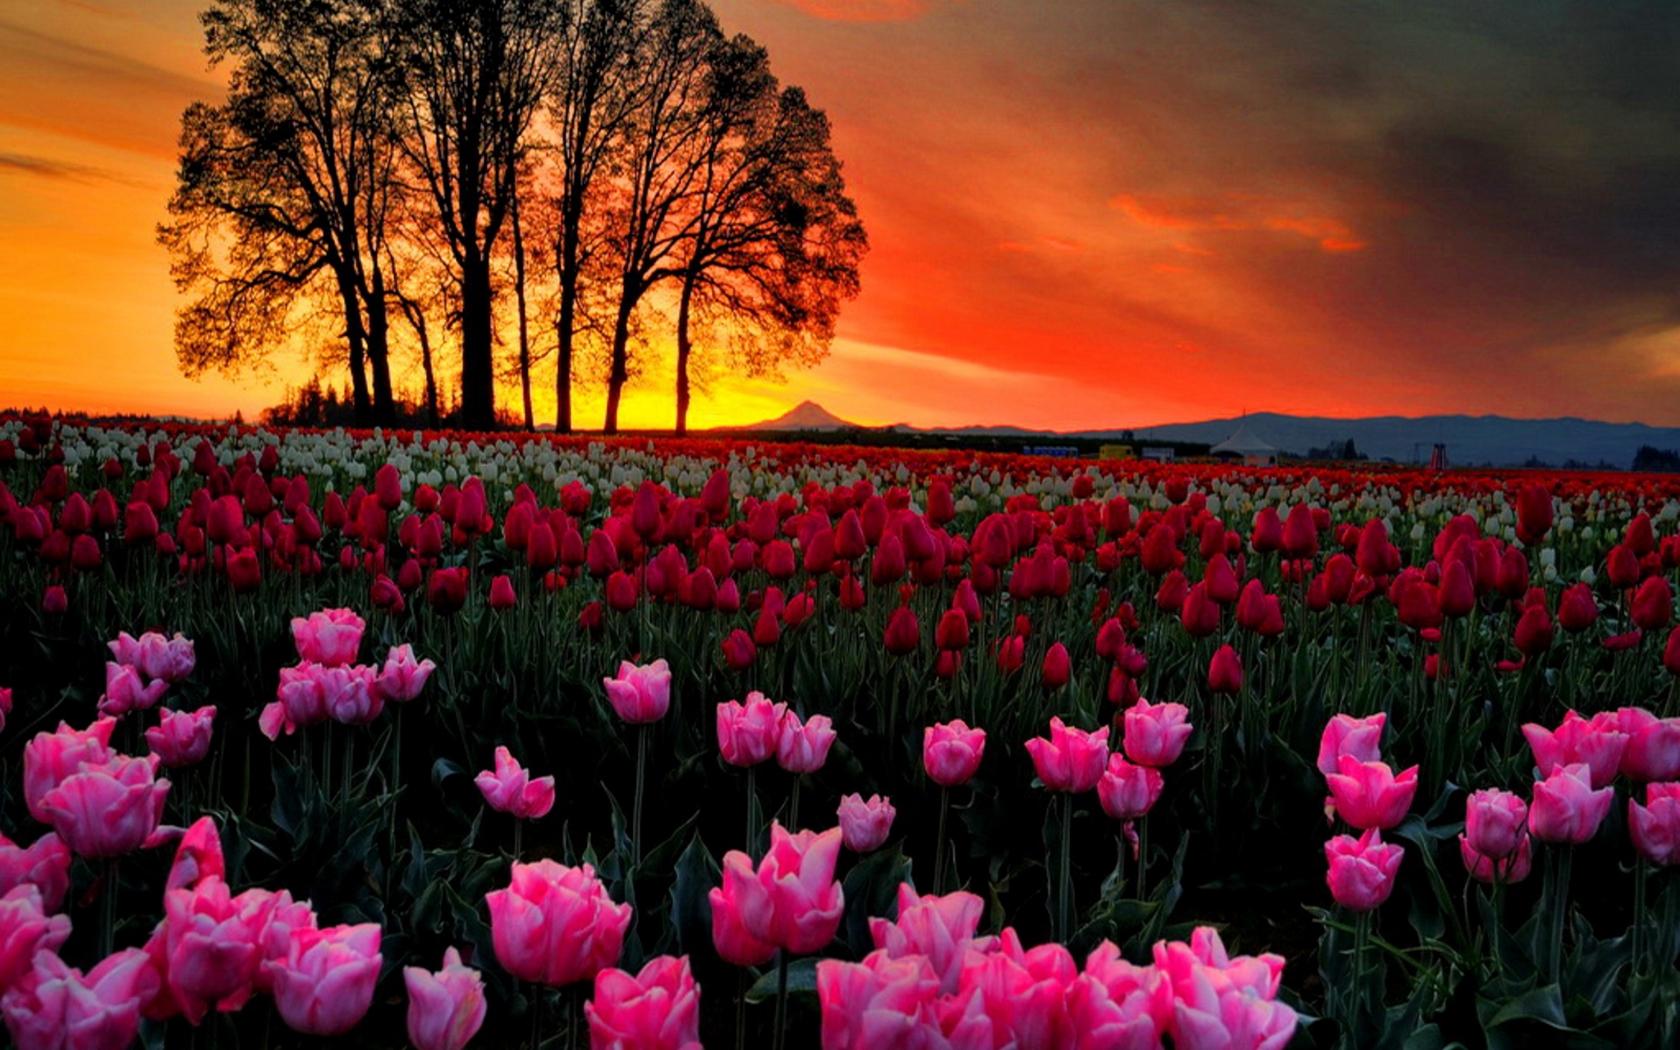 Spring Flowers Tulips Field Sunrise Grass Clouds: Sunset Tulips Landscape HD Wallpaper